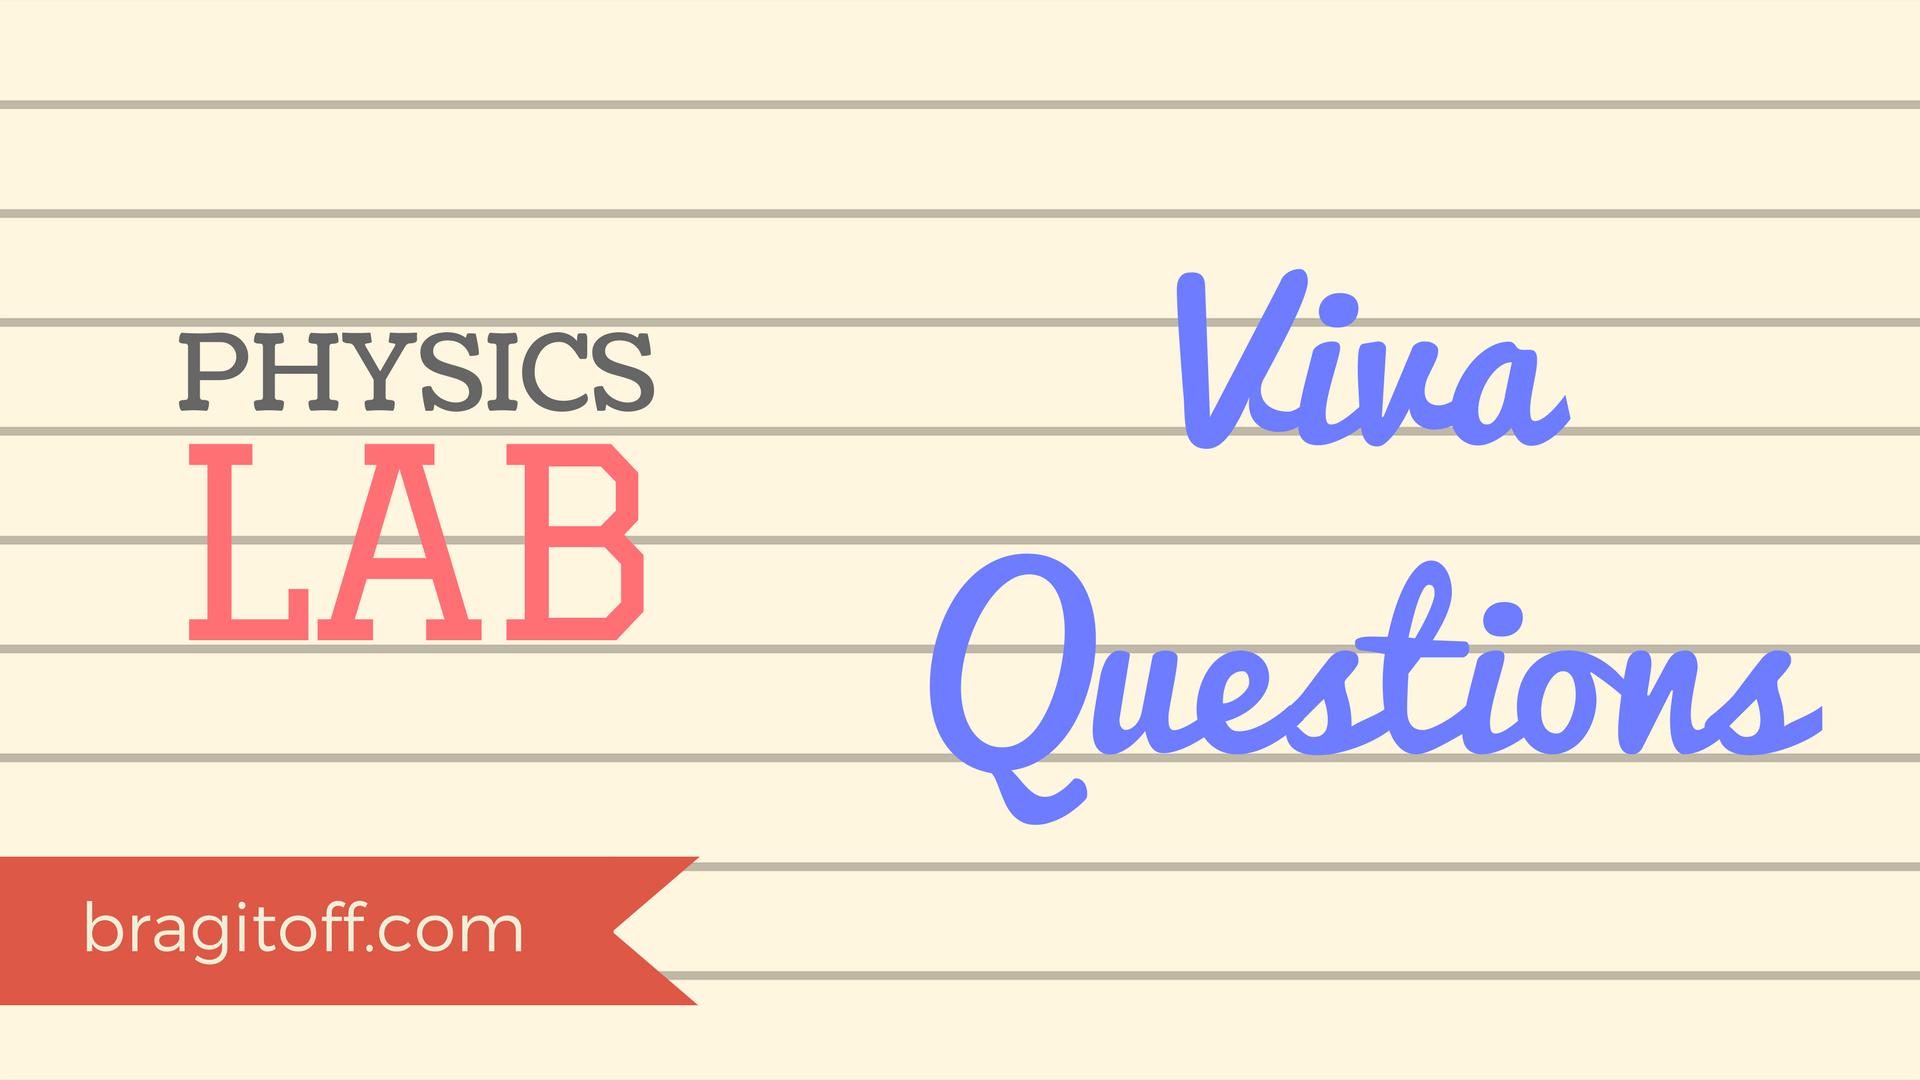 velocity of sound in air viva questions bragitoff com web programming lab manual pdf web programming lab manual pdf